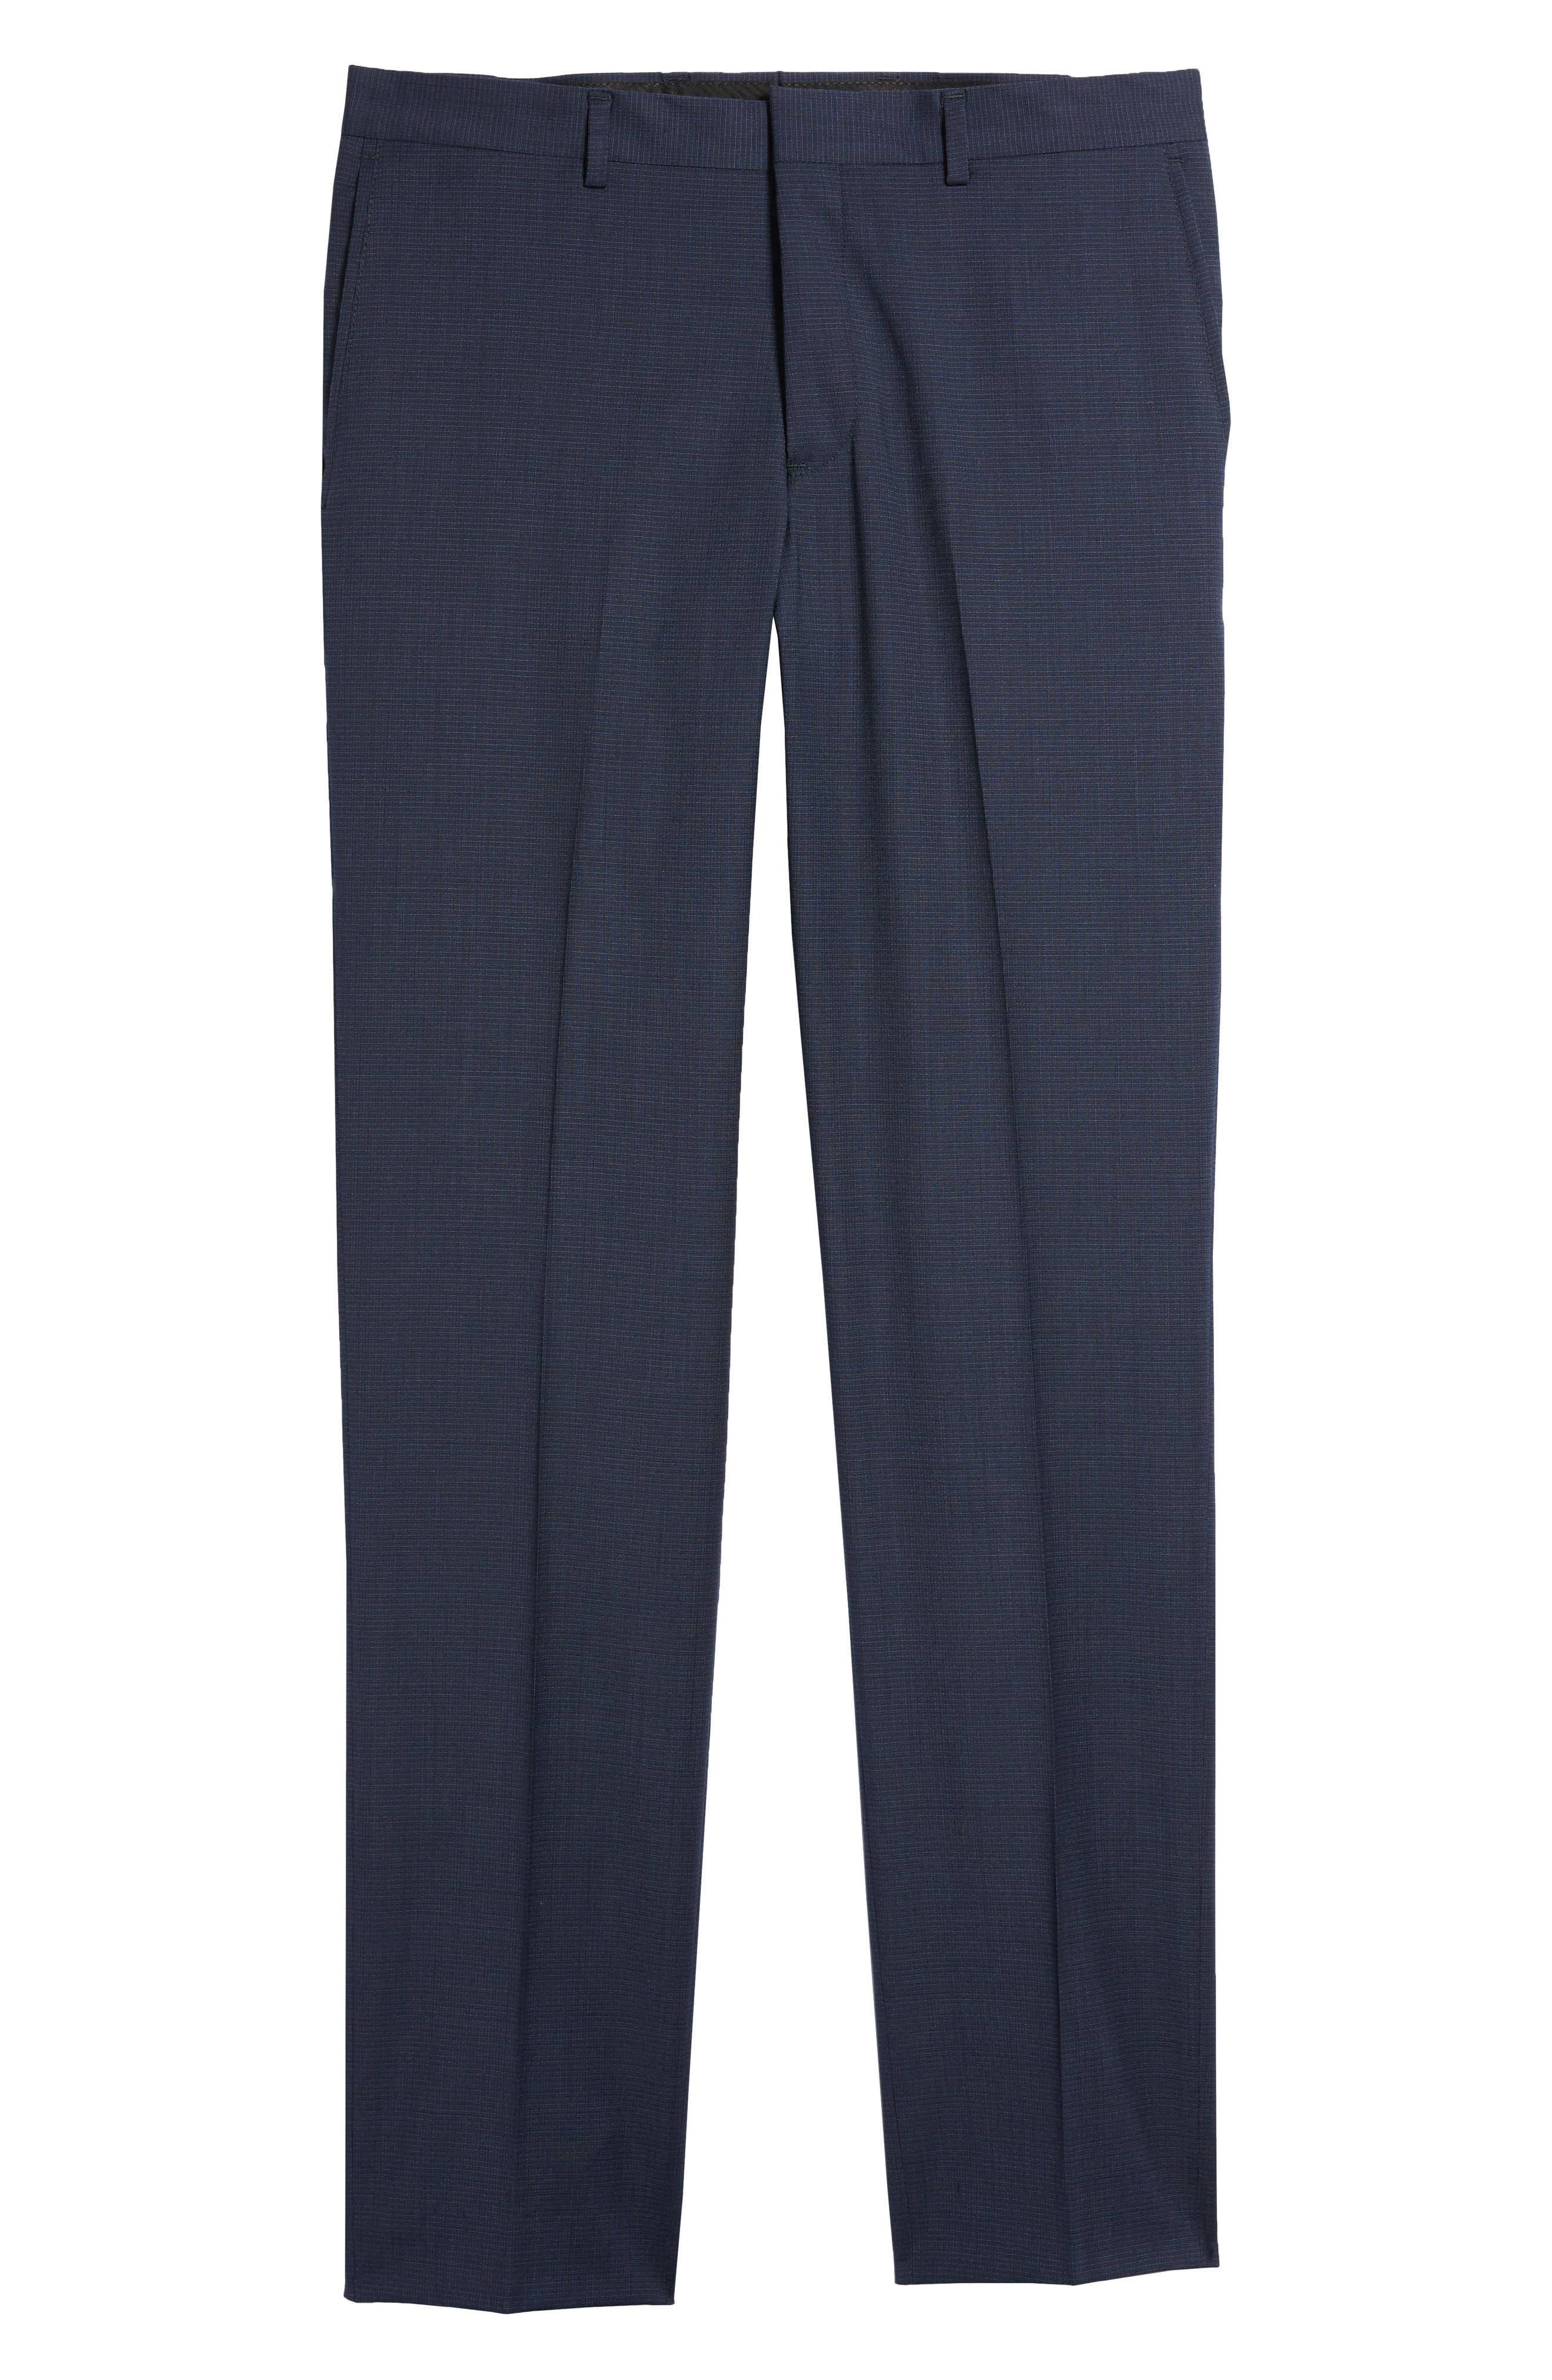 Tech-Smart Flat Front Stretch Wool Pants,                             Alternate thumbnail 6, color,                             Navy